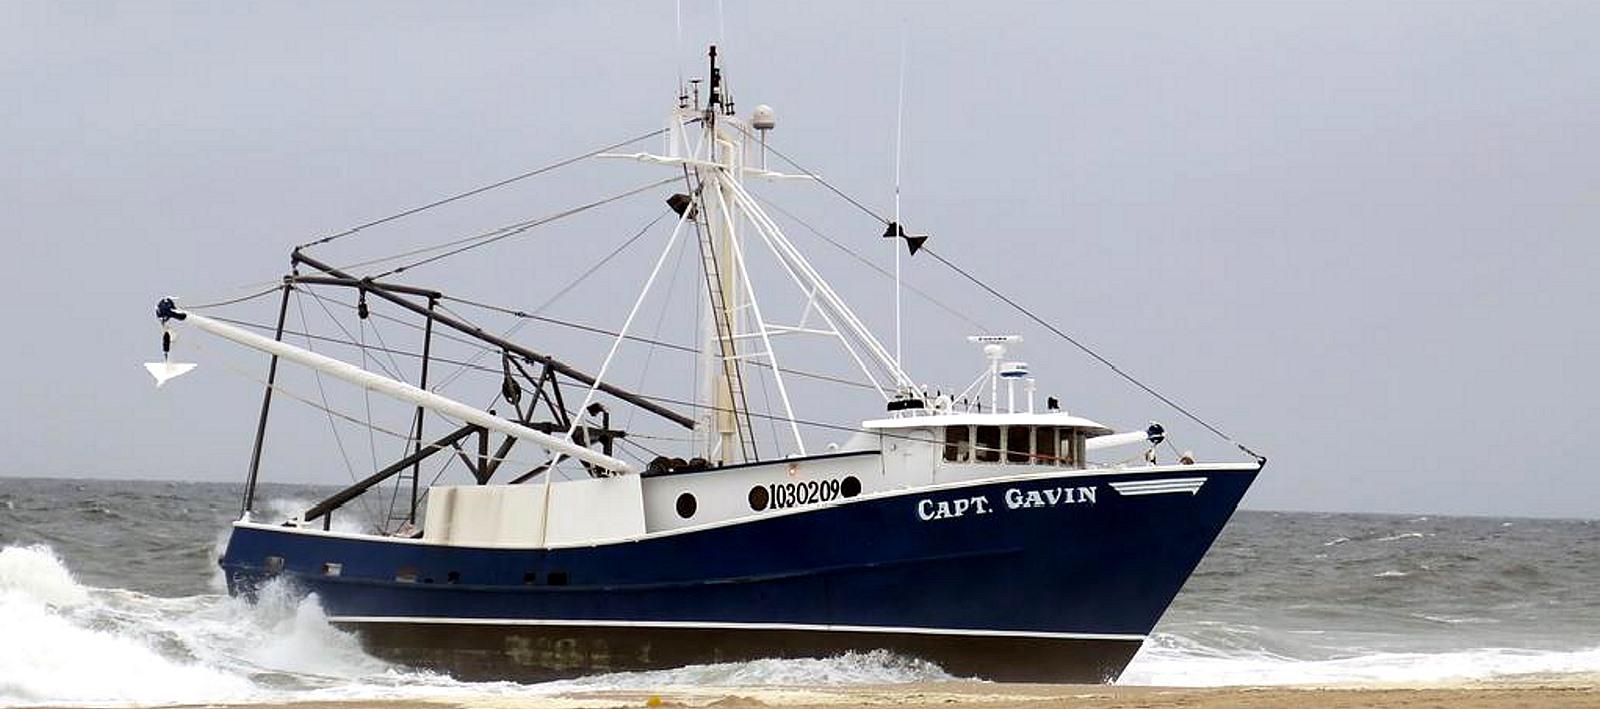 amerikanische marine reserveflotte